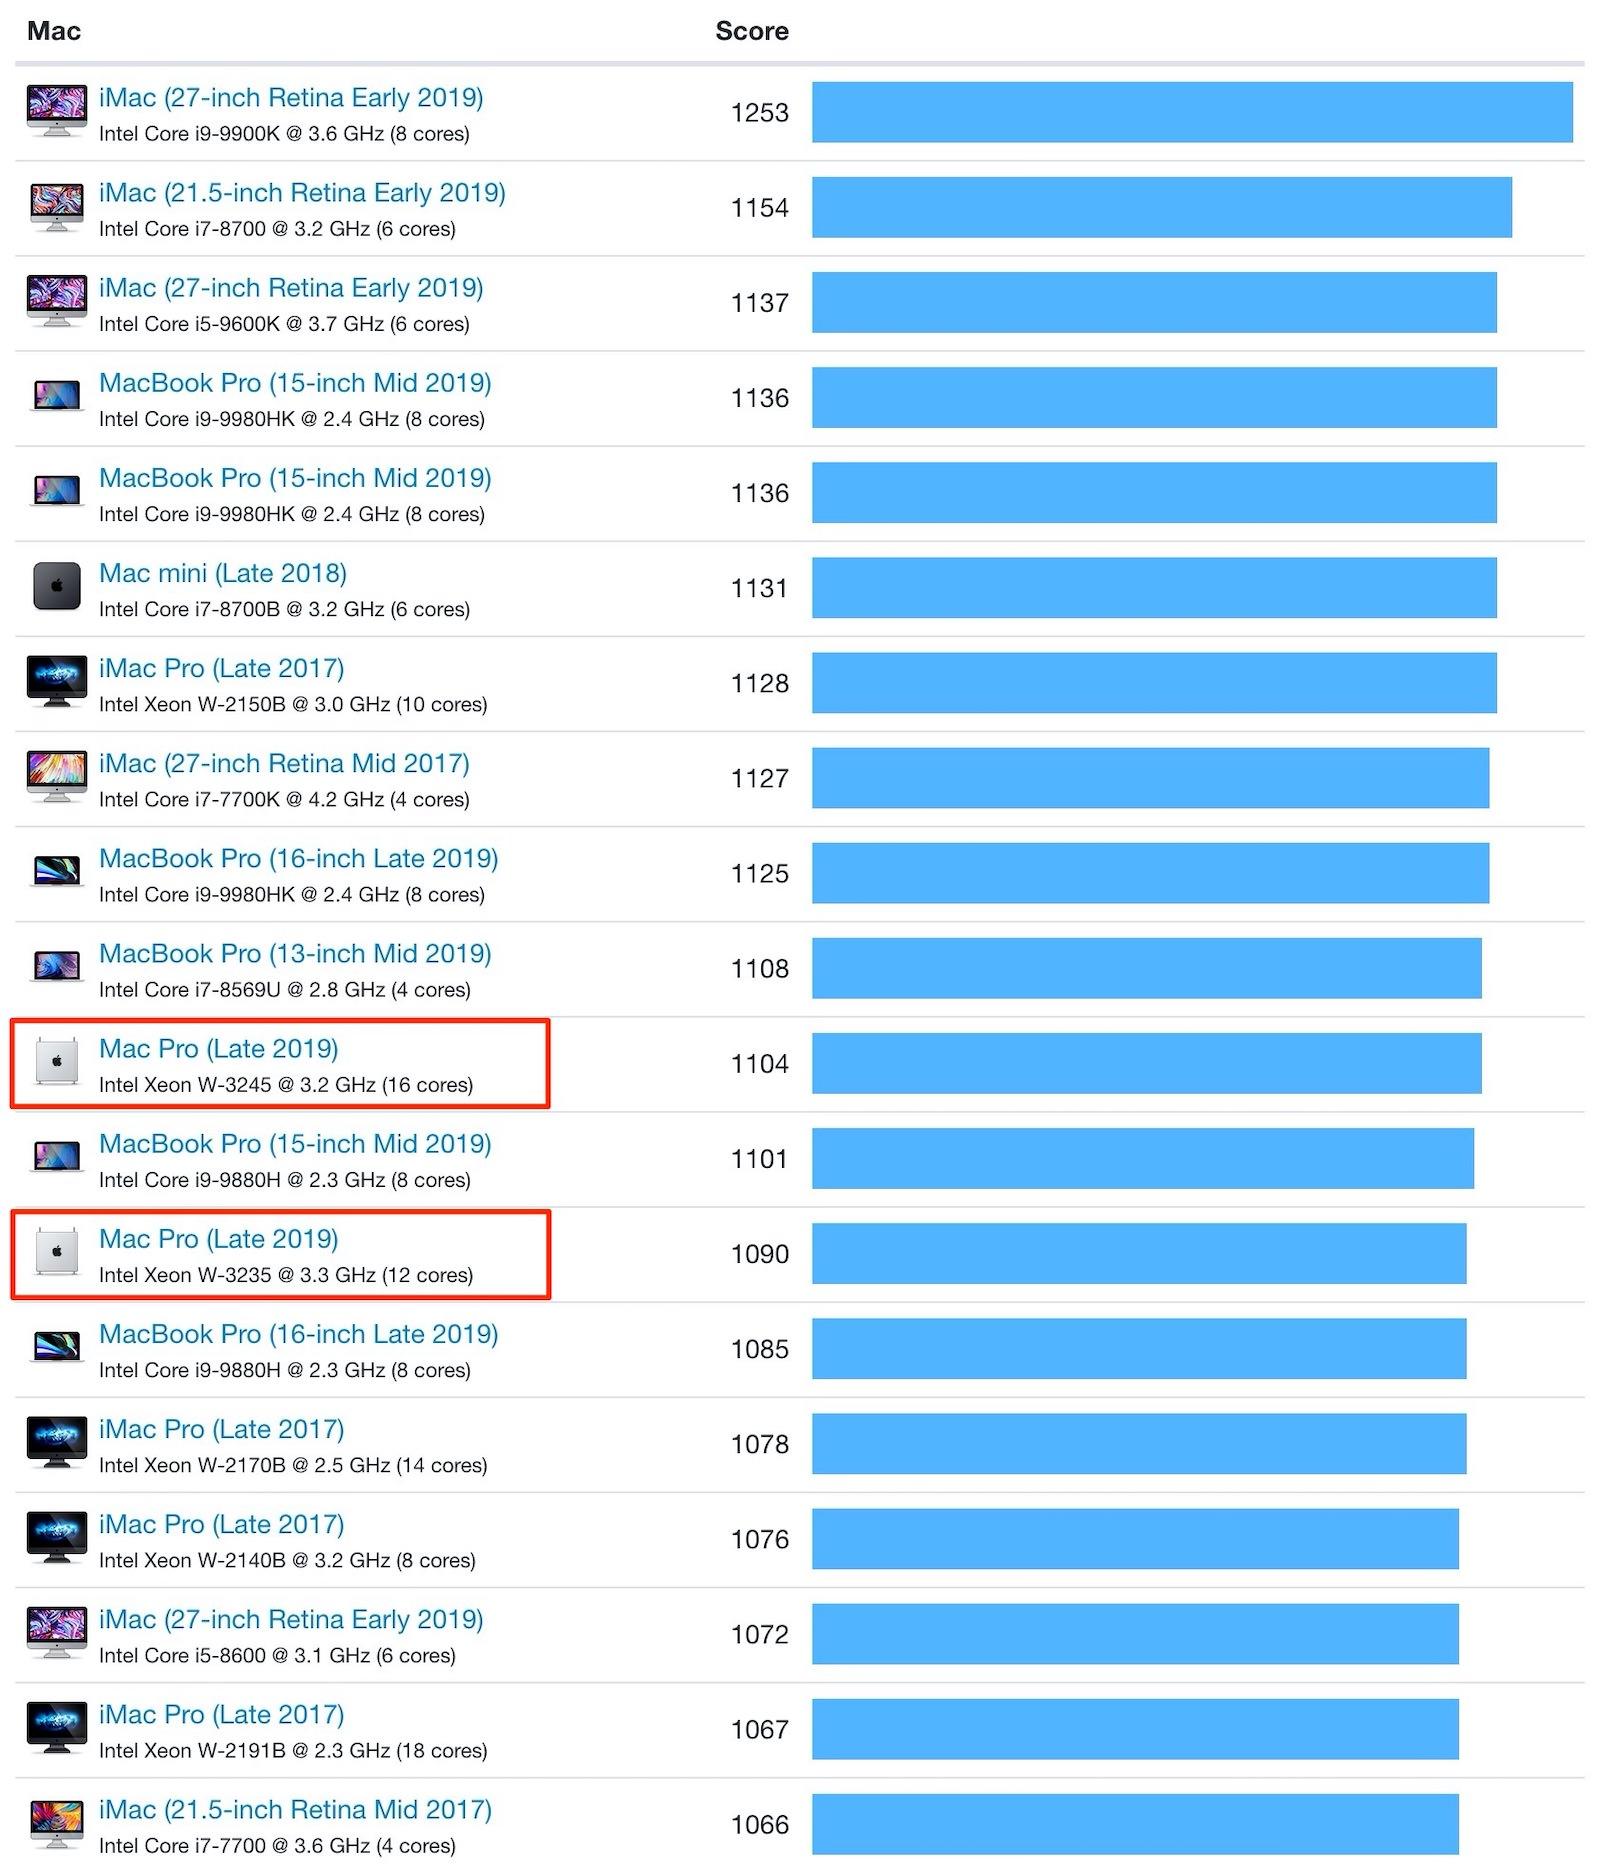 Mac-Pro-Geekbench-Results-2.jpg